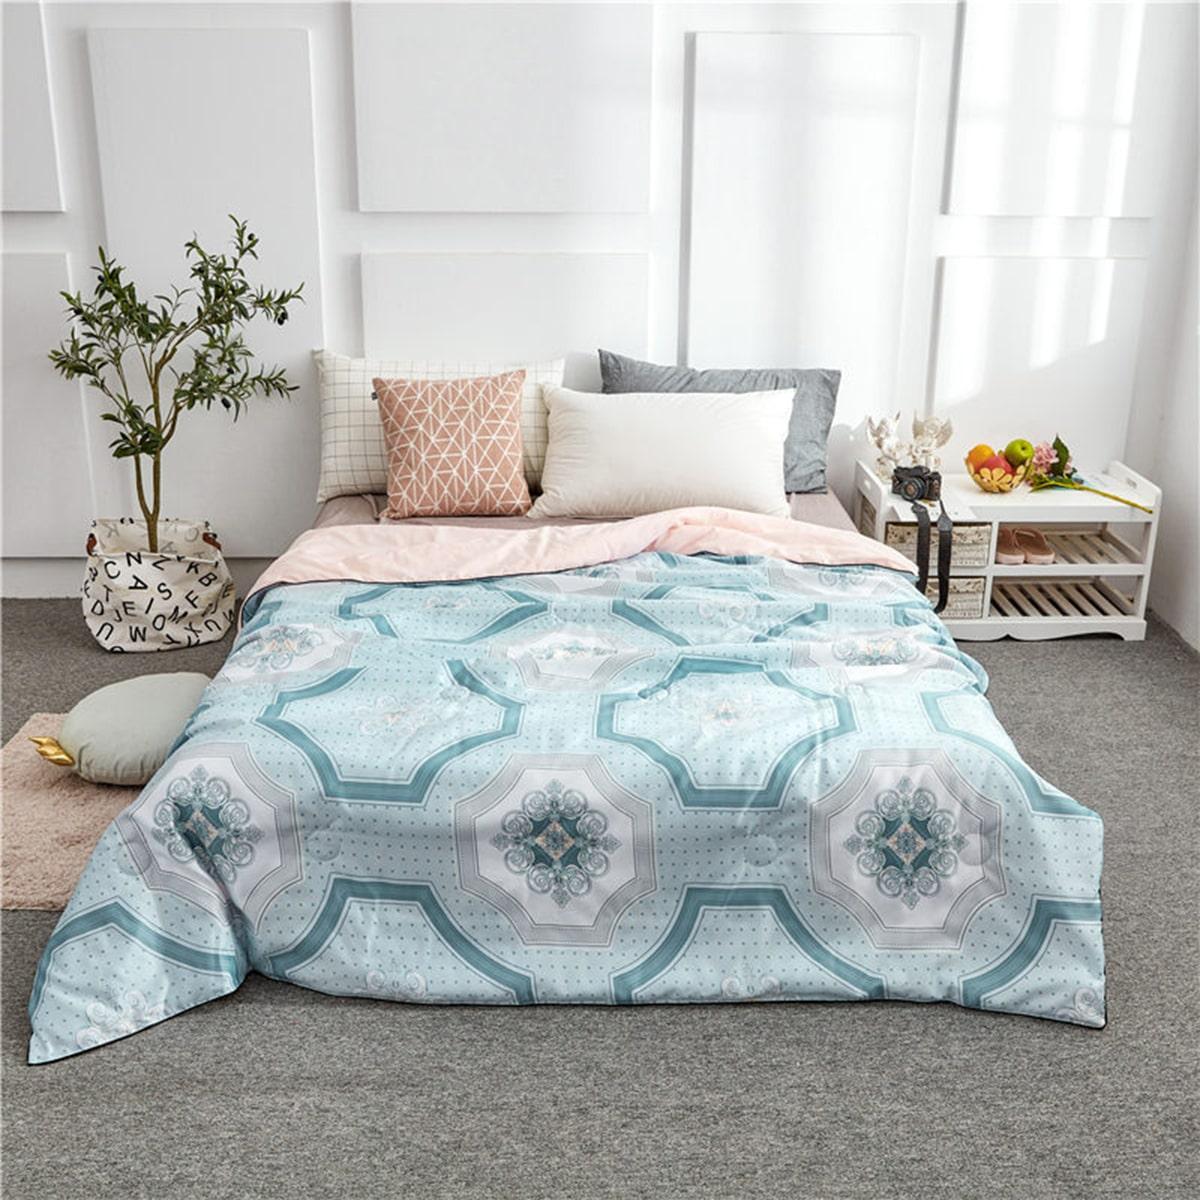 Geometrische & polka dot print quilt